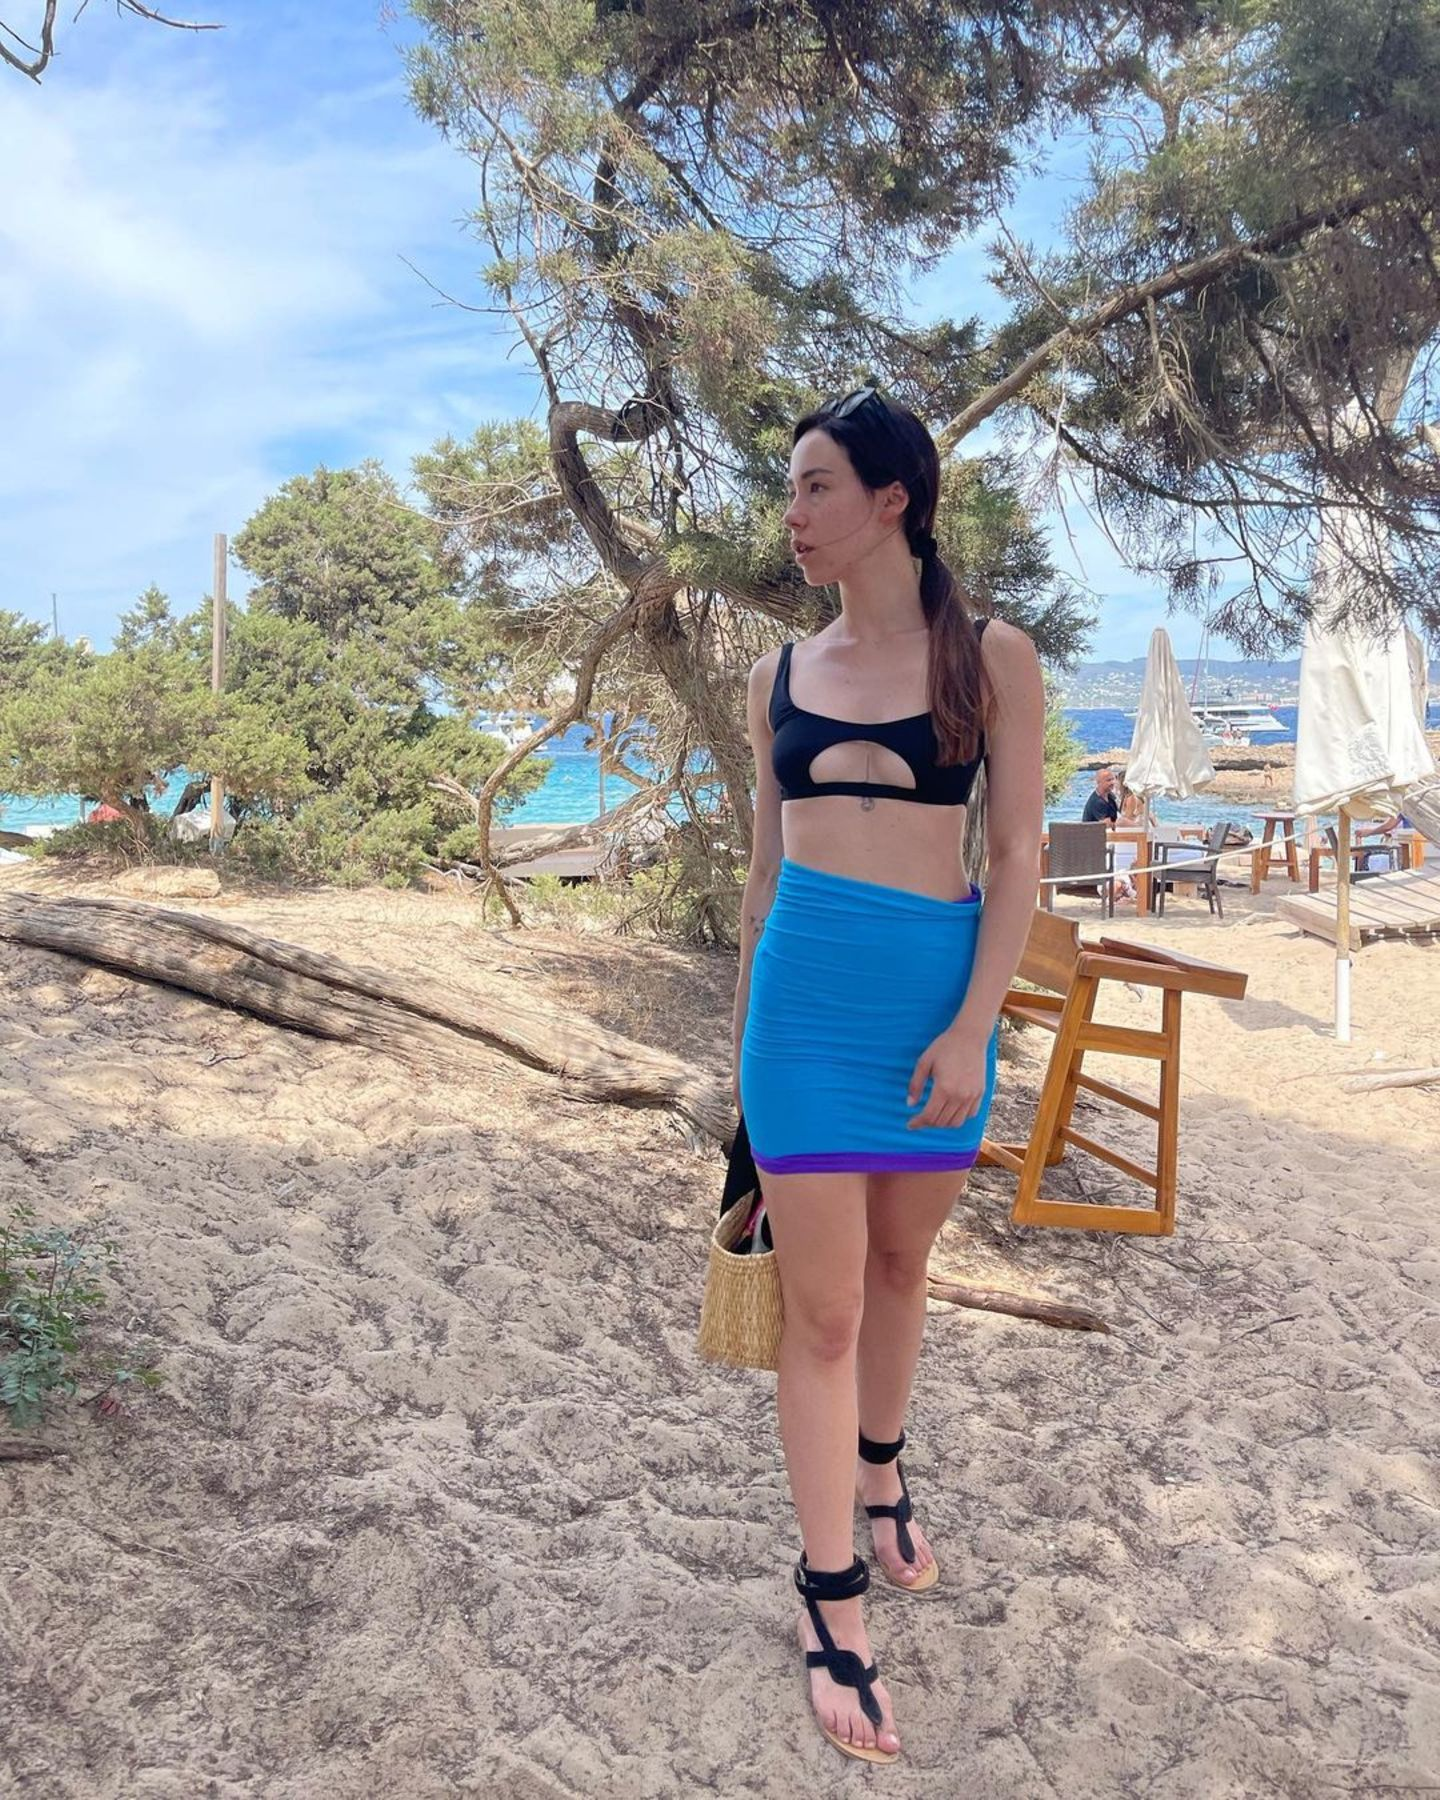 Aurora Ramazzotti am Strand